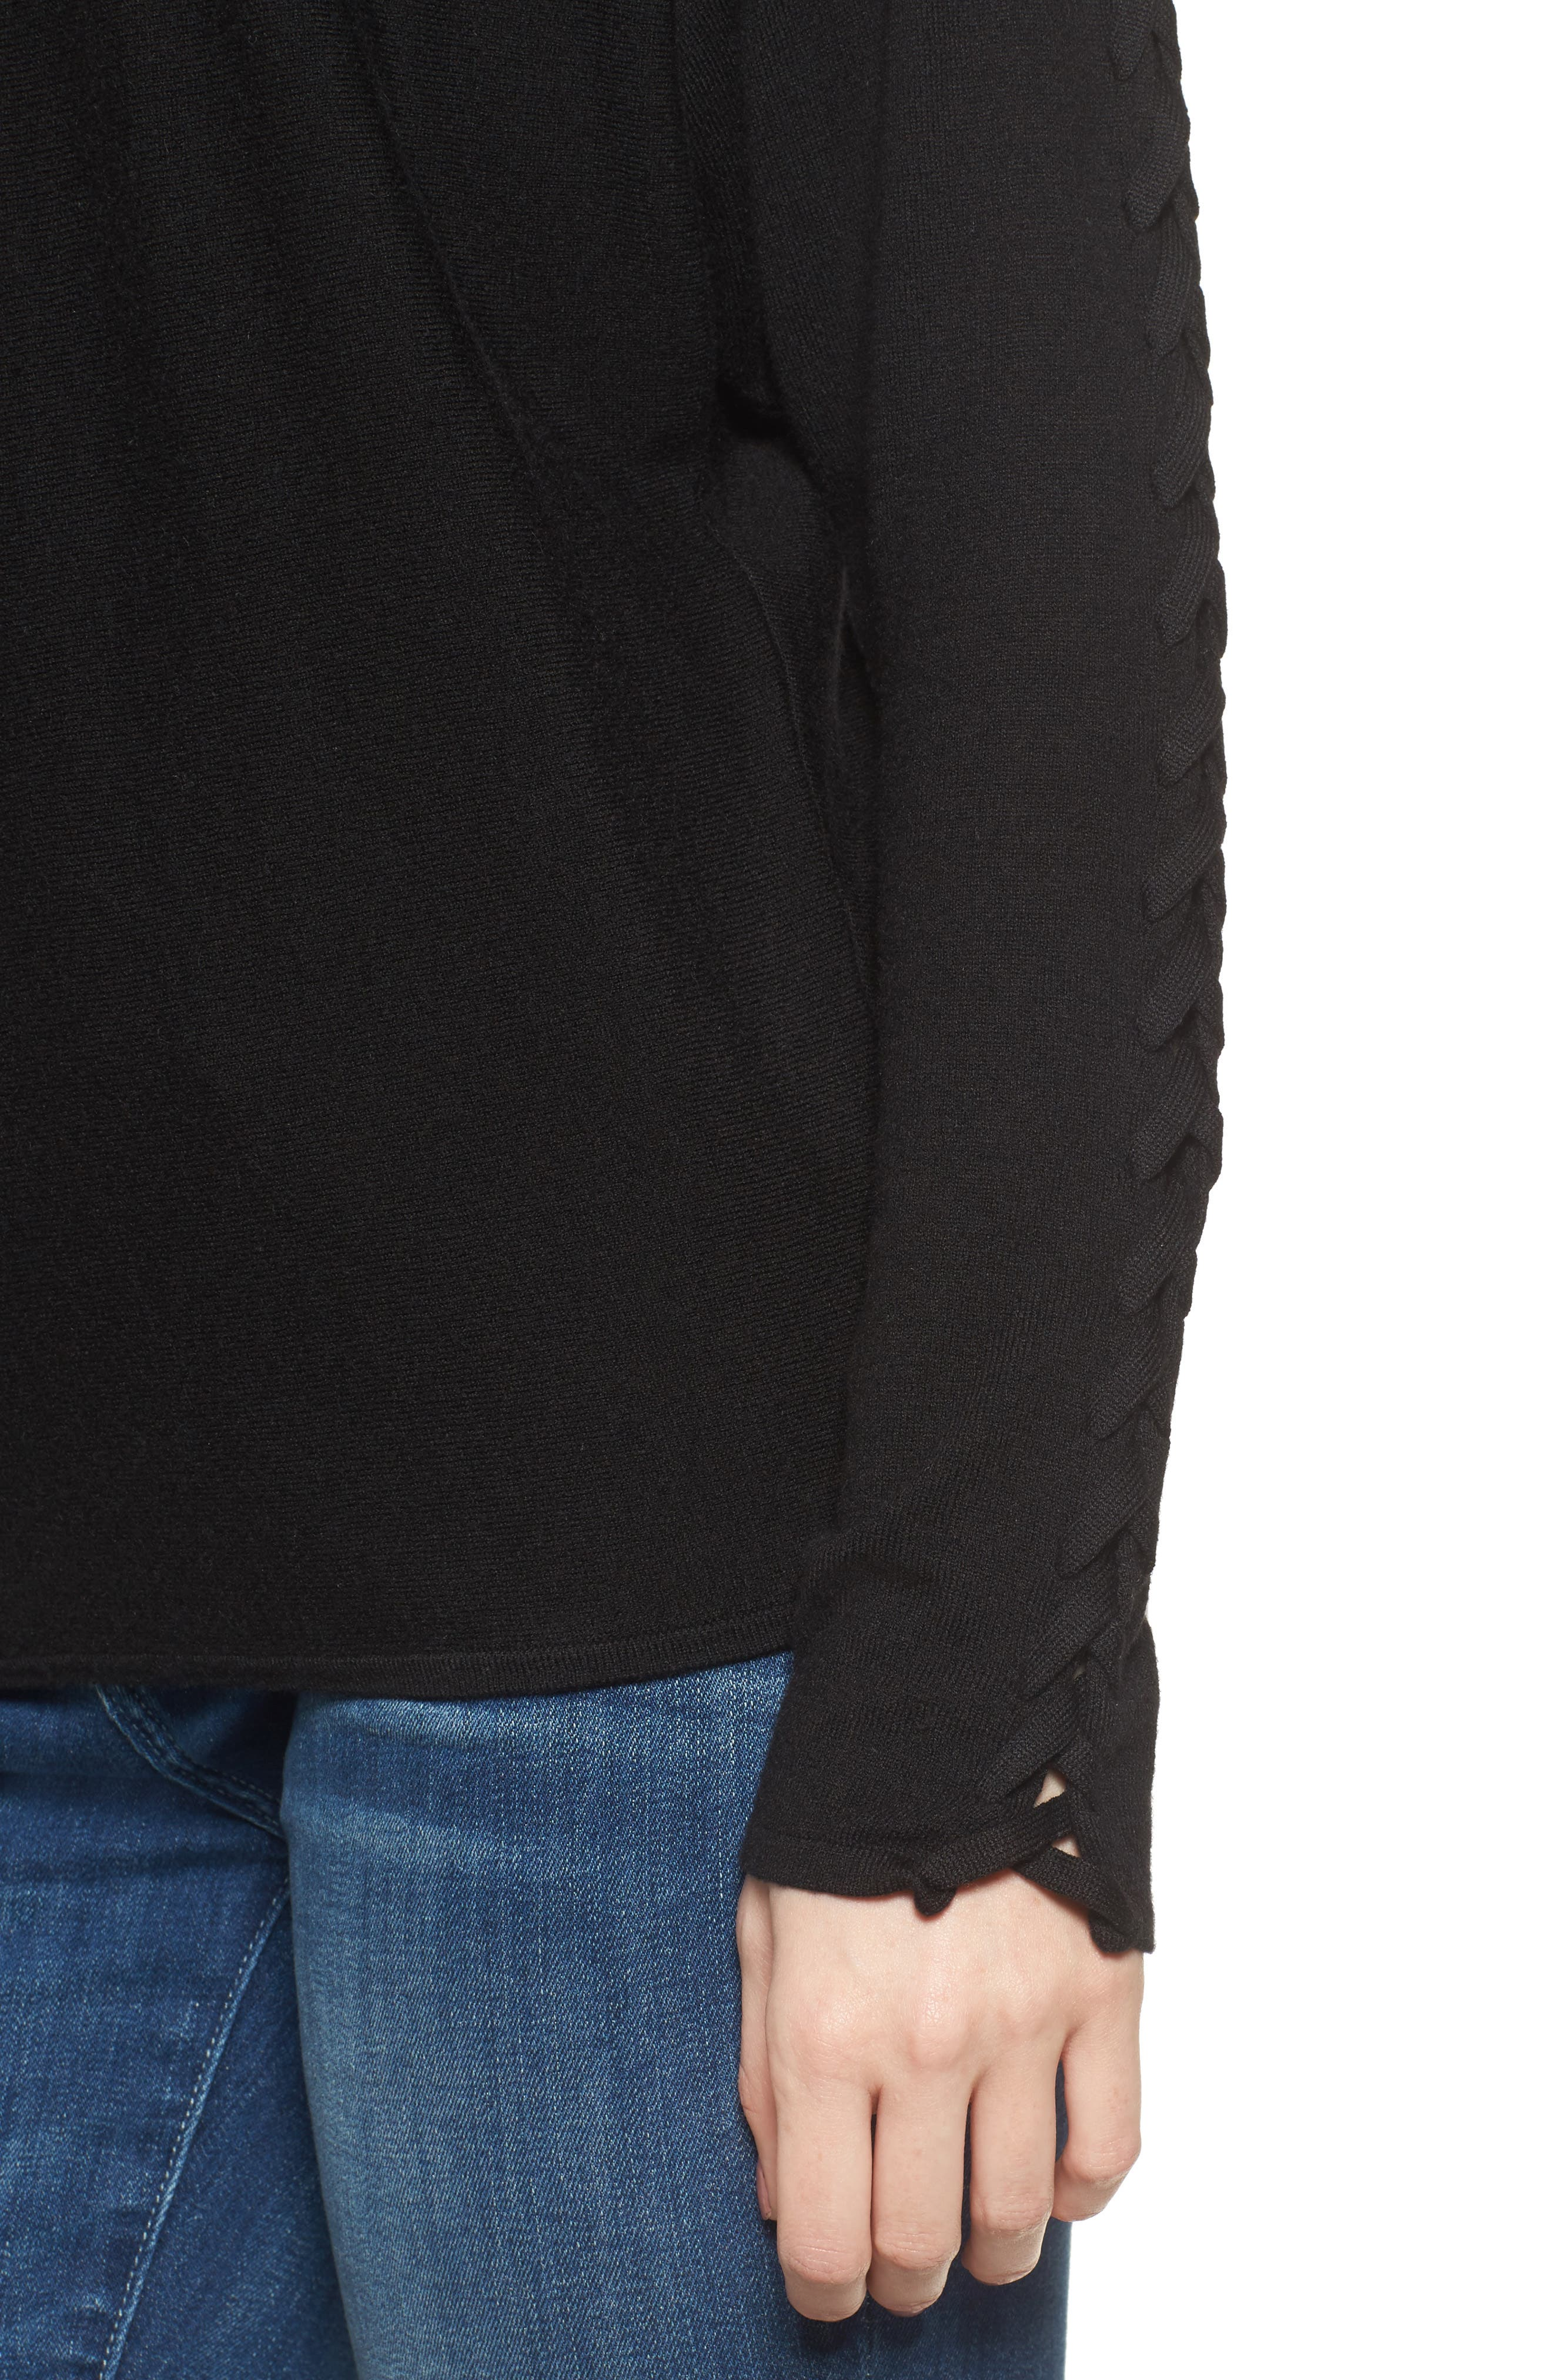 Victoire Turtleneck Sweater,                             Alternate thumbnail 4, color,                             Black